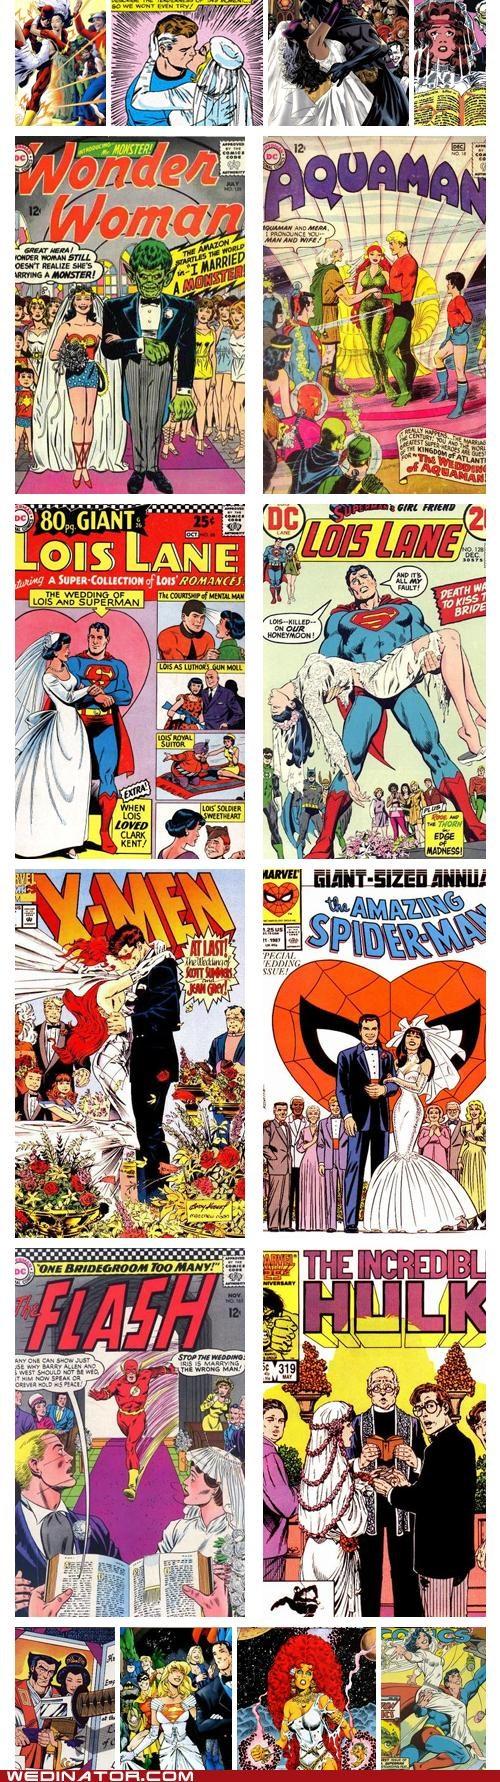 batman comic books comics funny wedding photos Hall of Fame Spider-Man superheroes superman x men - 5278157312